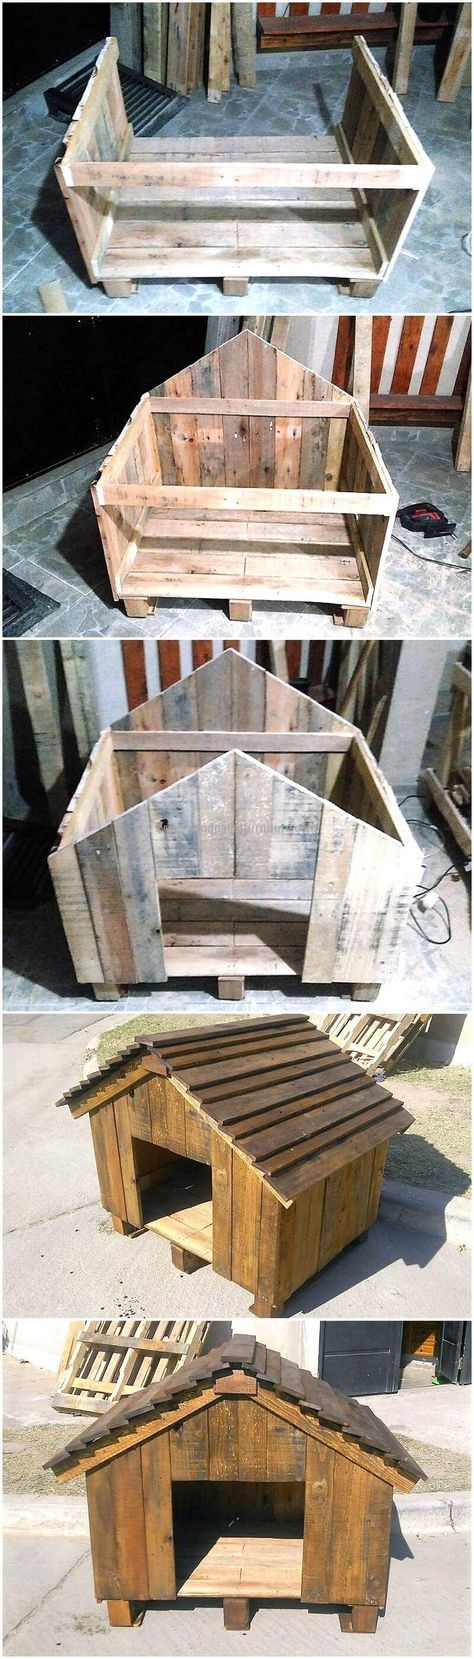 DIY Wooden Pallets Made Dog House